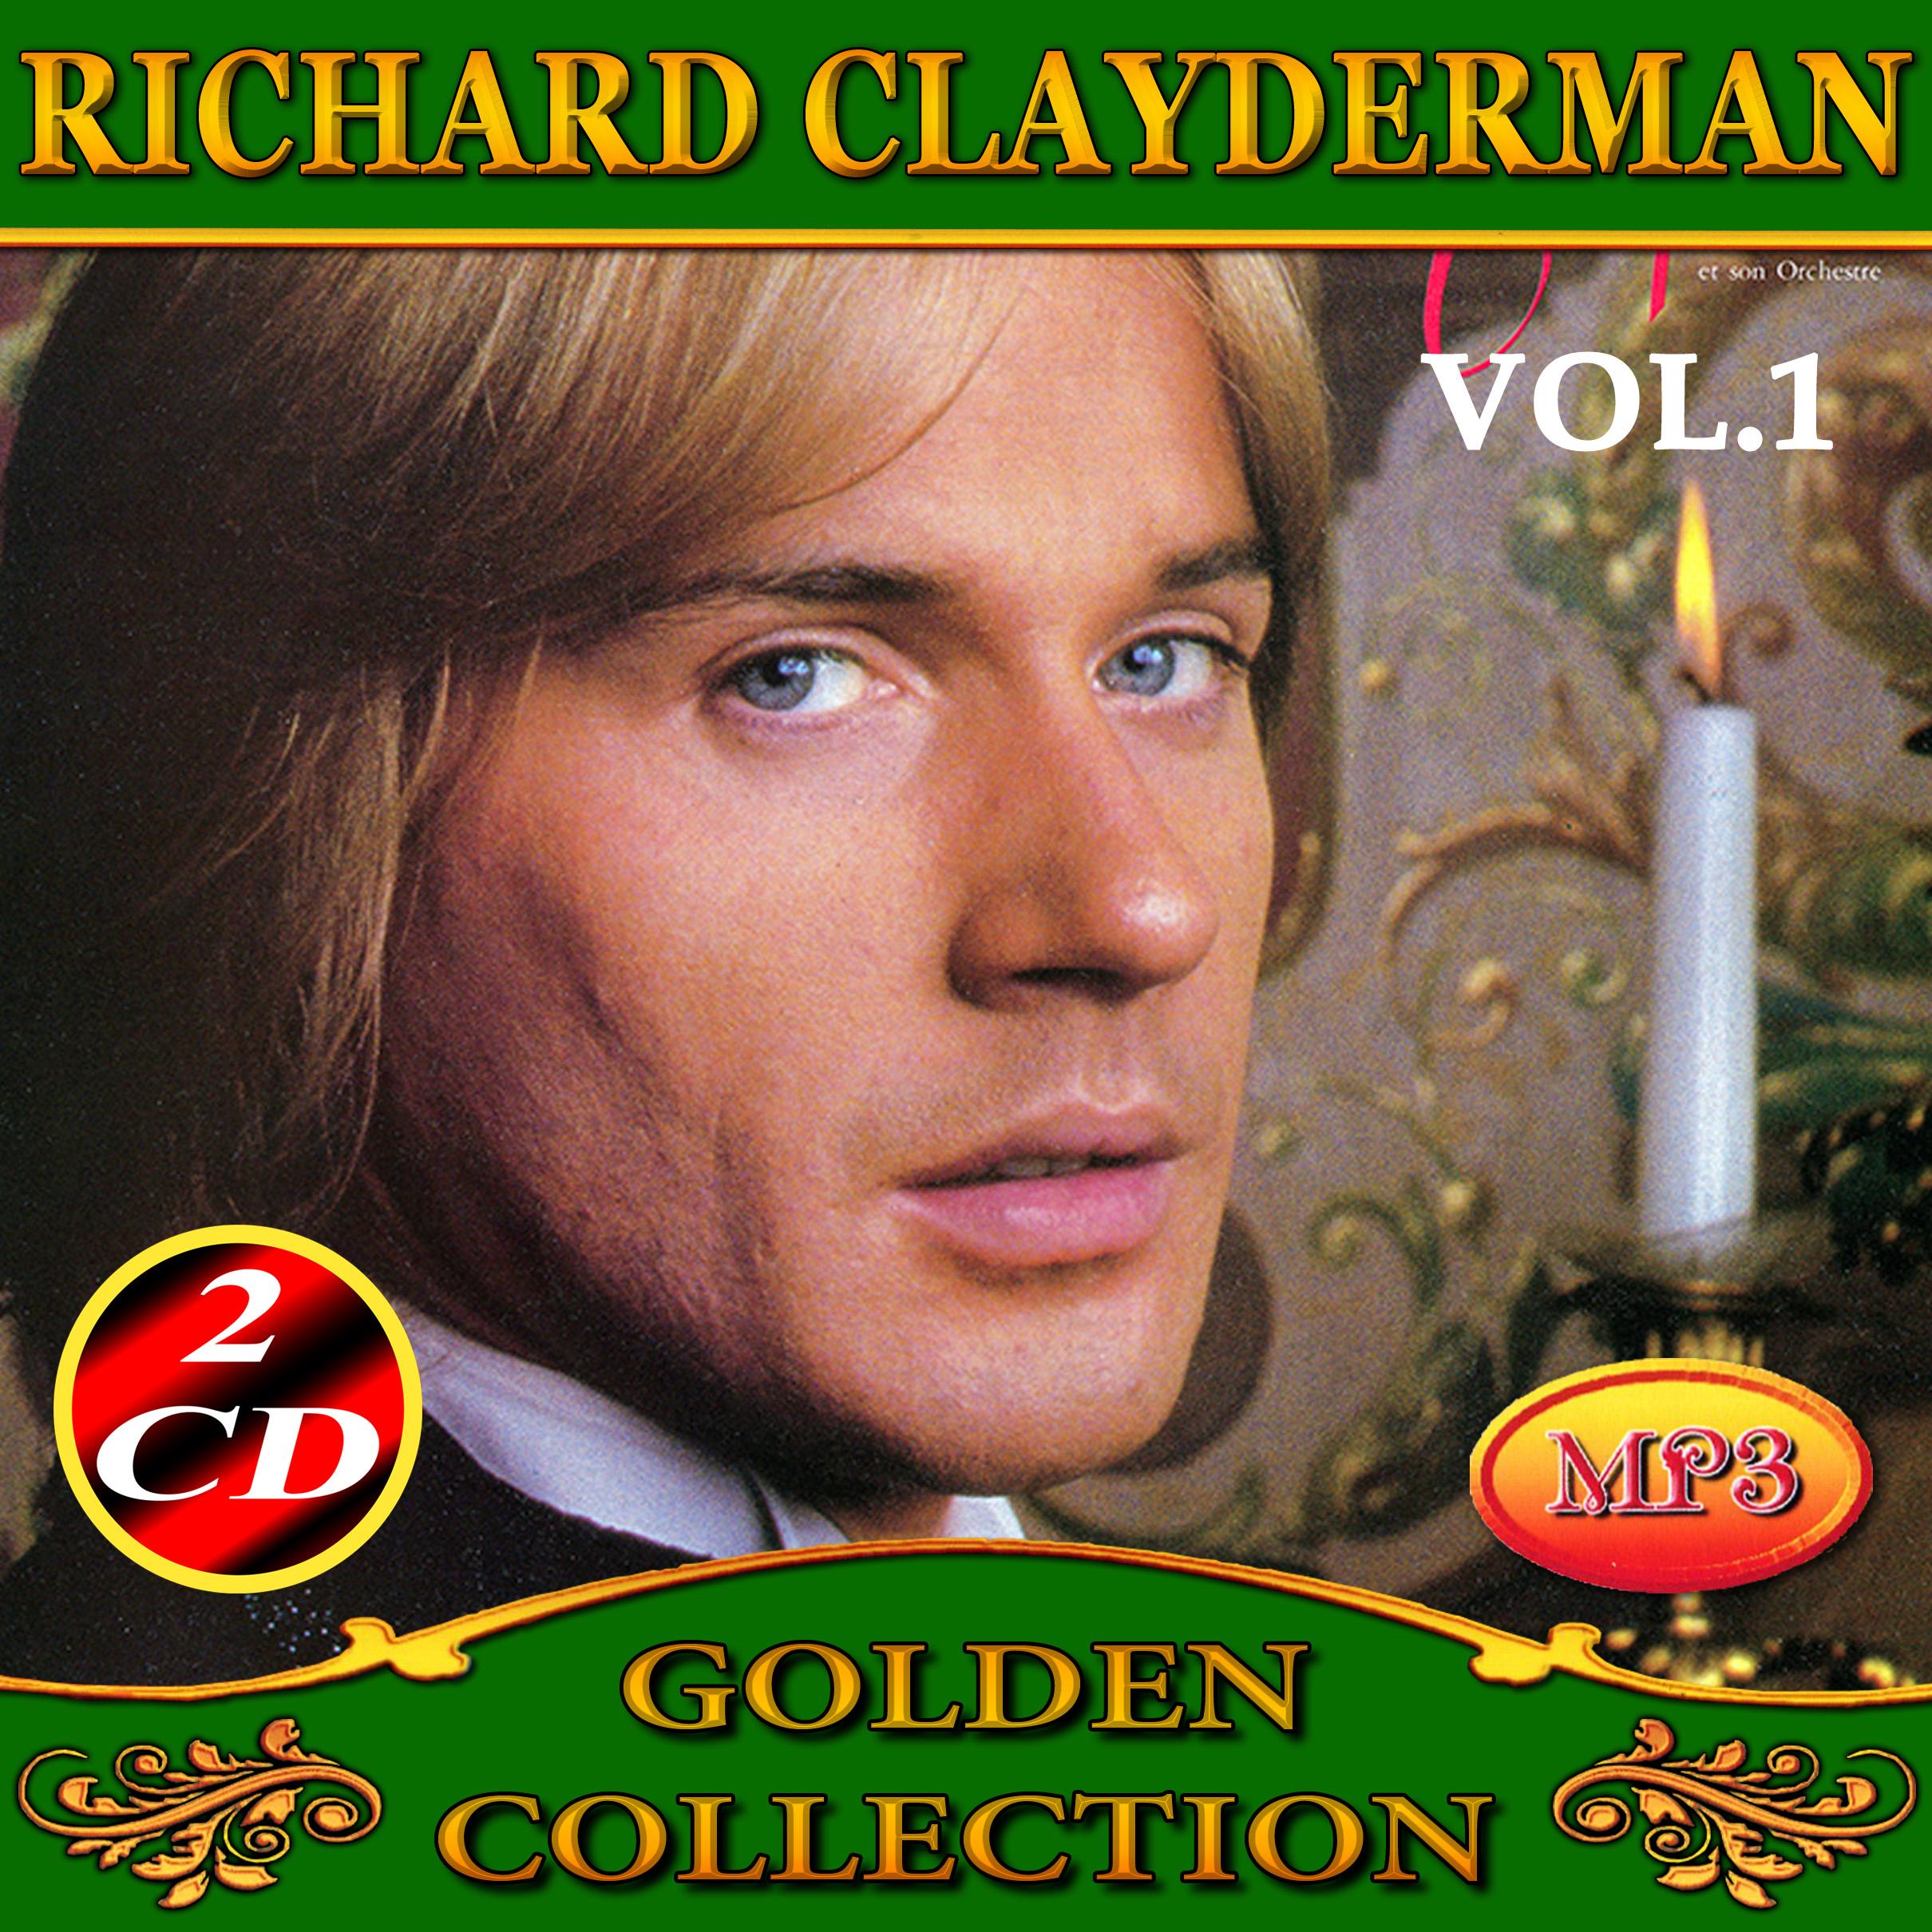 Richard Clayderman 1ч2cd [mp3]